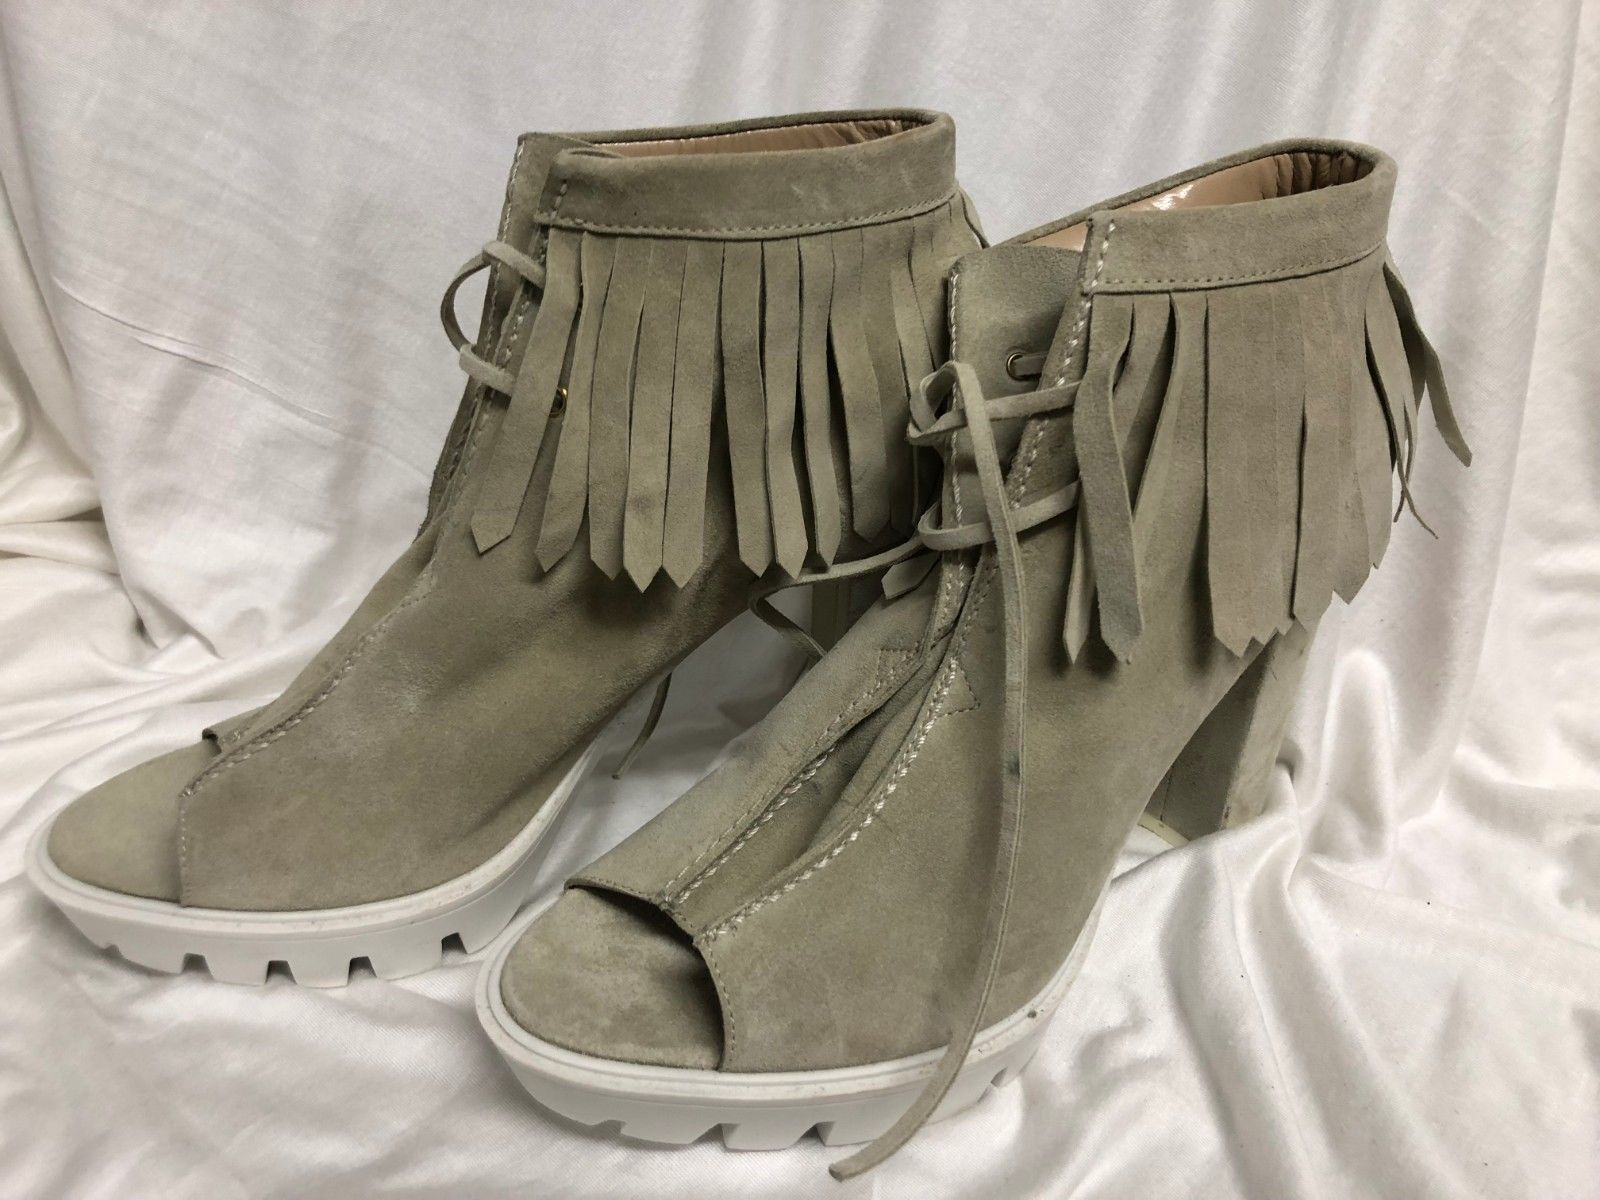 BCBG MAXAZRIA SHOES  suede gray white combat heel close Pumps Size: 11/41